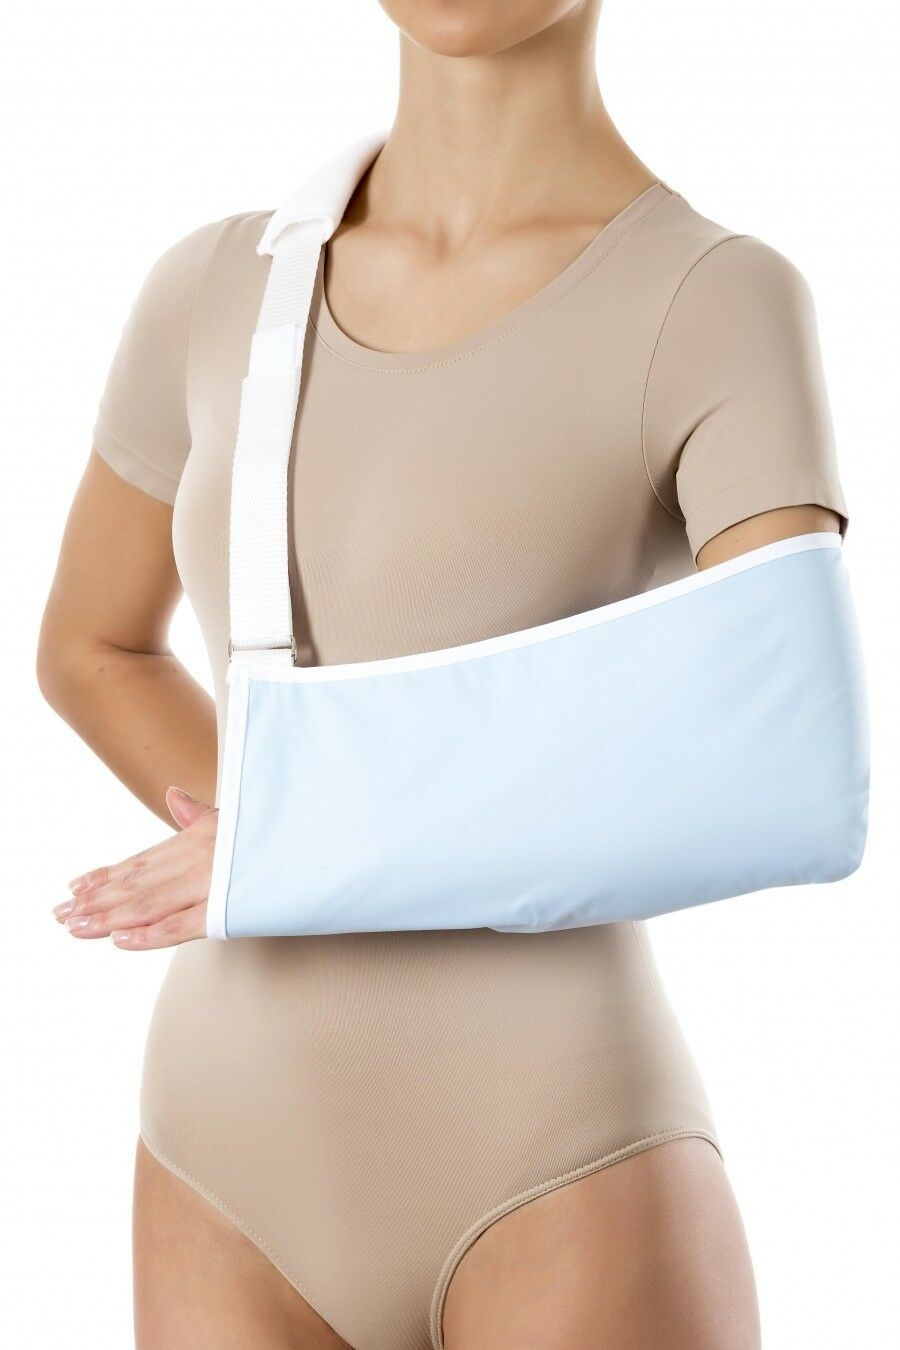 Armschlinge Armtragegurt Armbandage PANI TERESA® Armorthese Standard hell blau